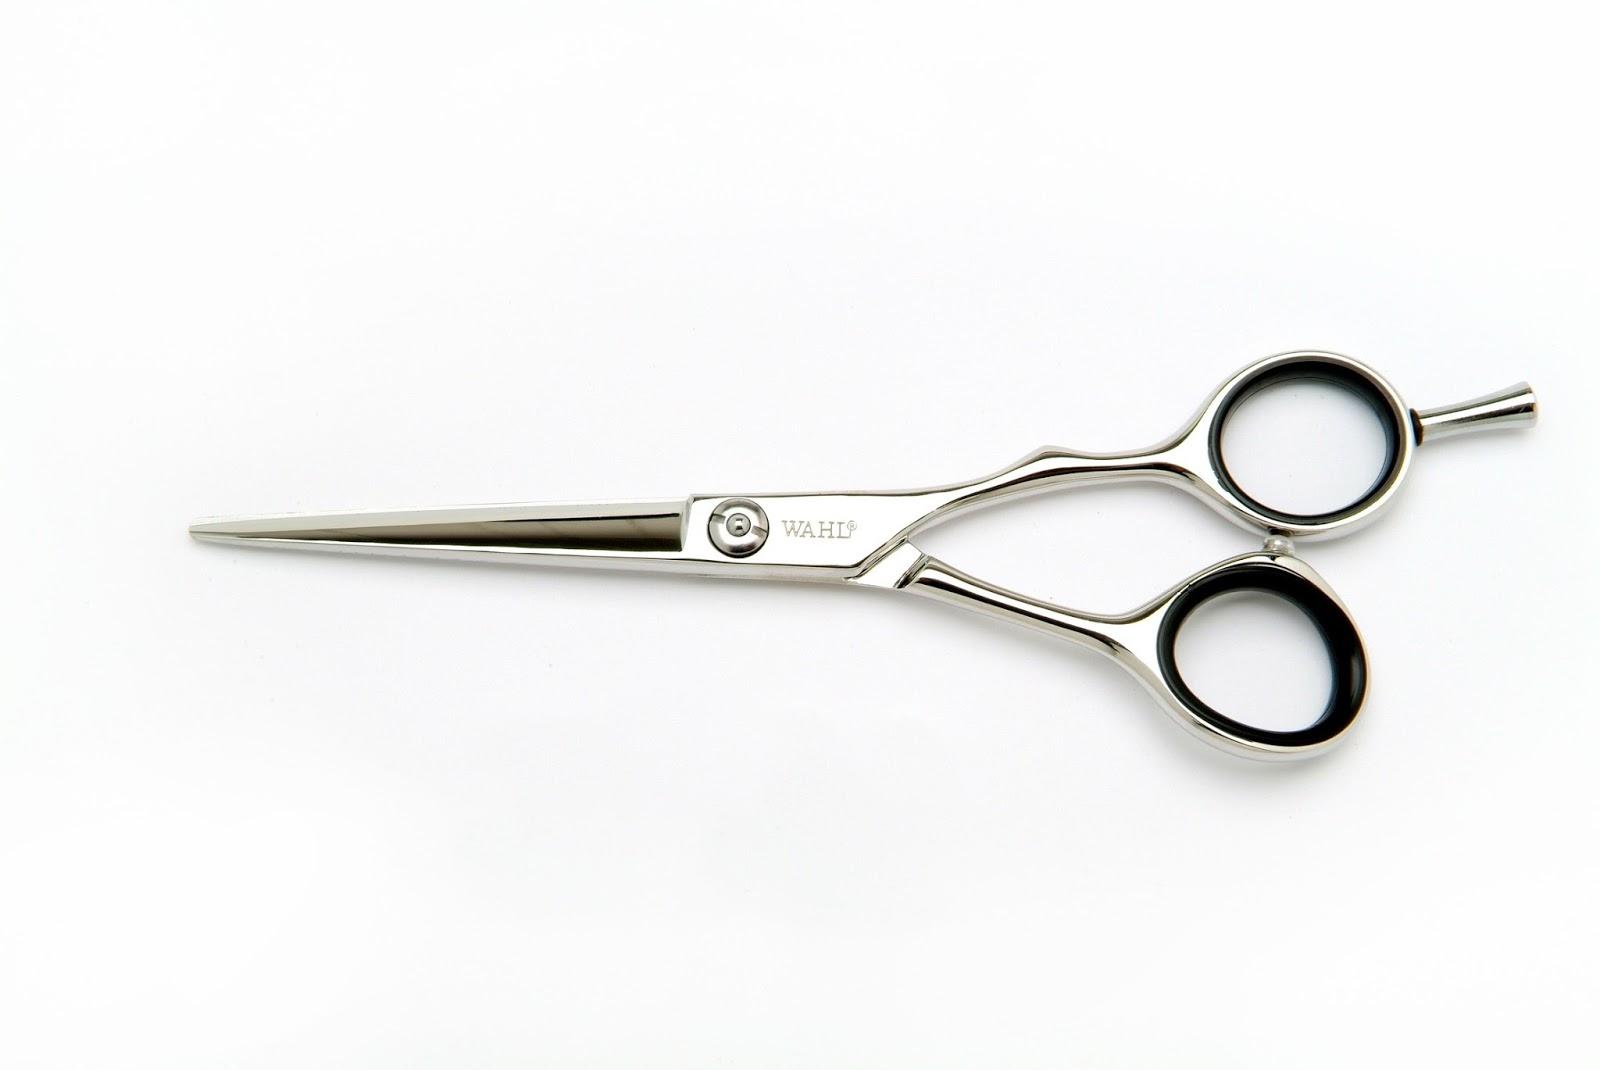 Kalau anda membuka barbershop atau pangkas rambut sebaiknya anda membeli  gunting yang sudah satu set yaitu sudah berisi gunting potong dan gunting  sasak dan ... 027766426d